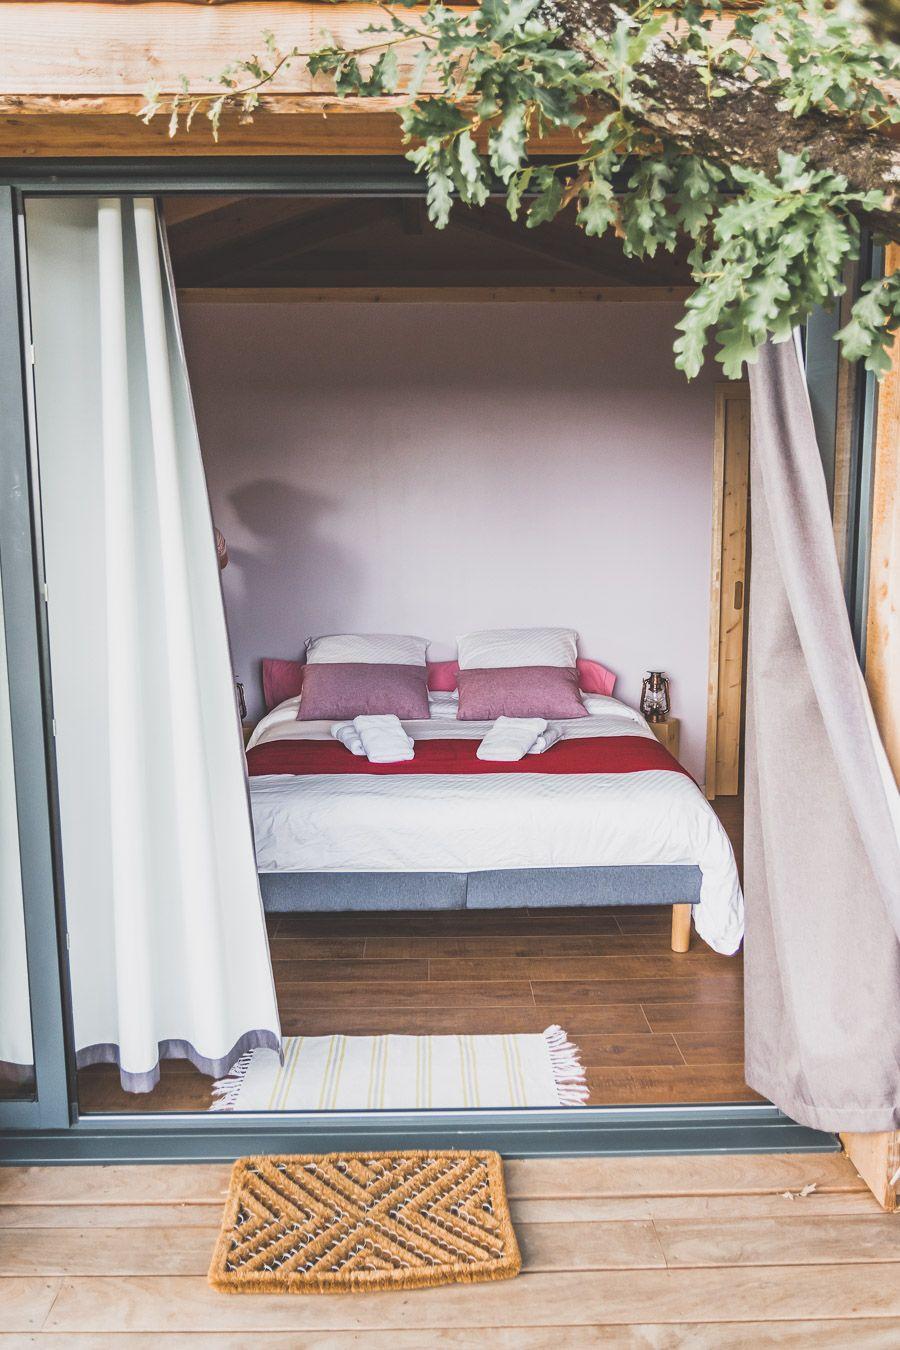 Où dormir dans le Gers ?